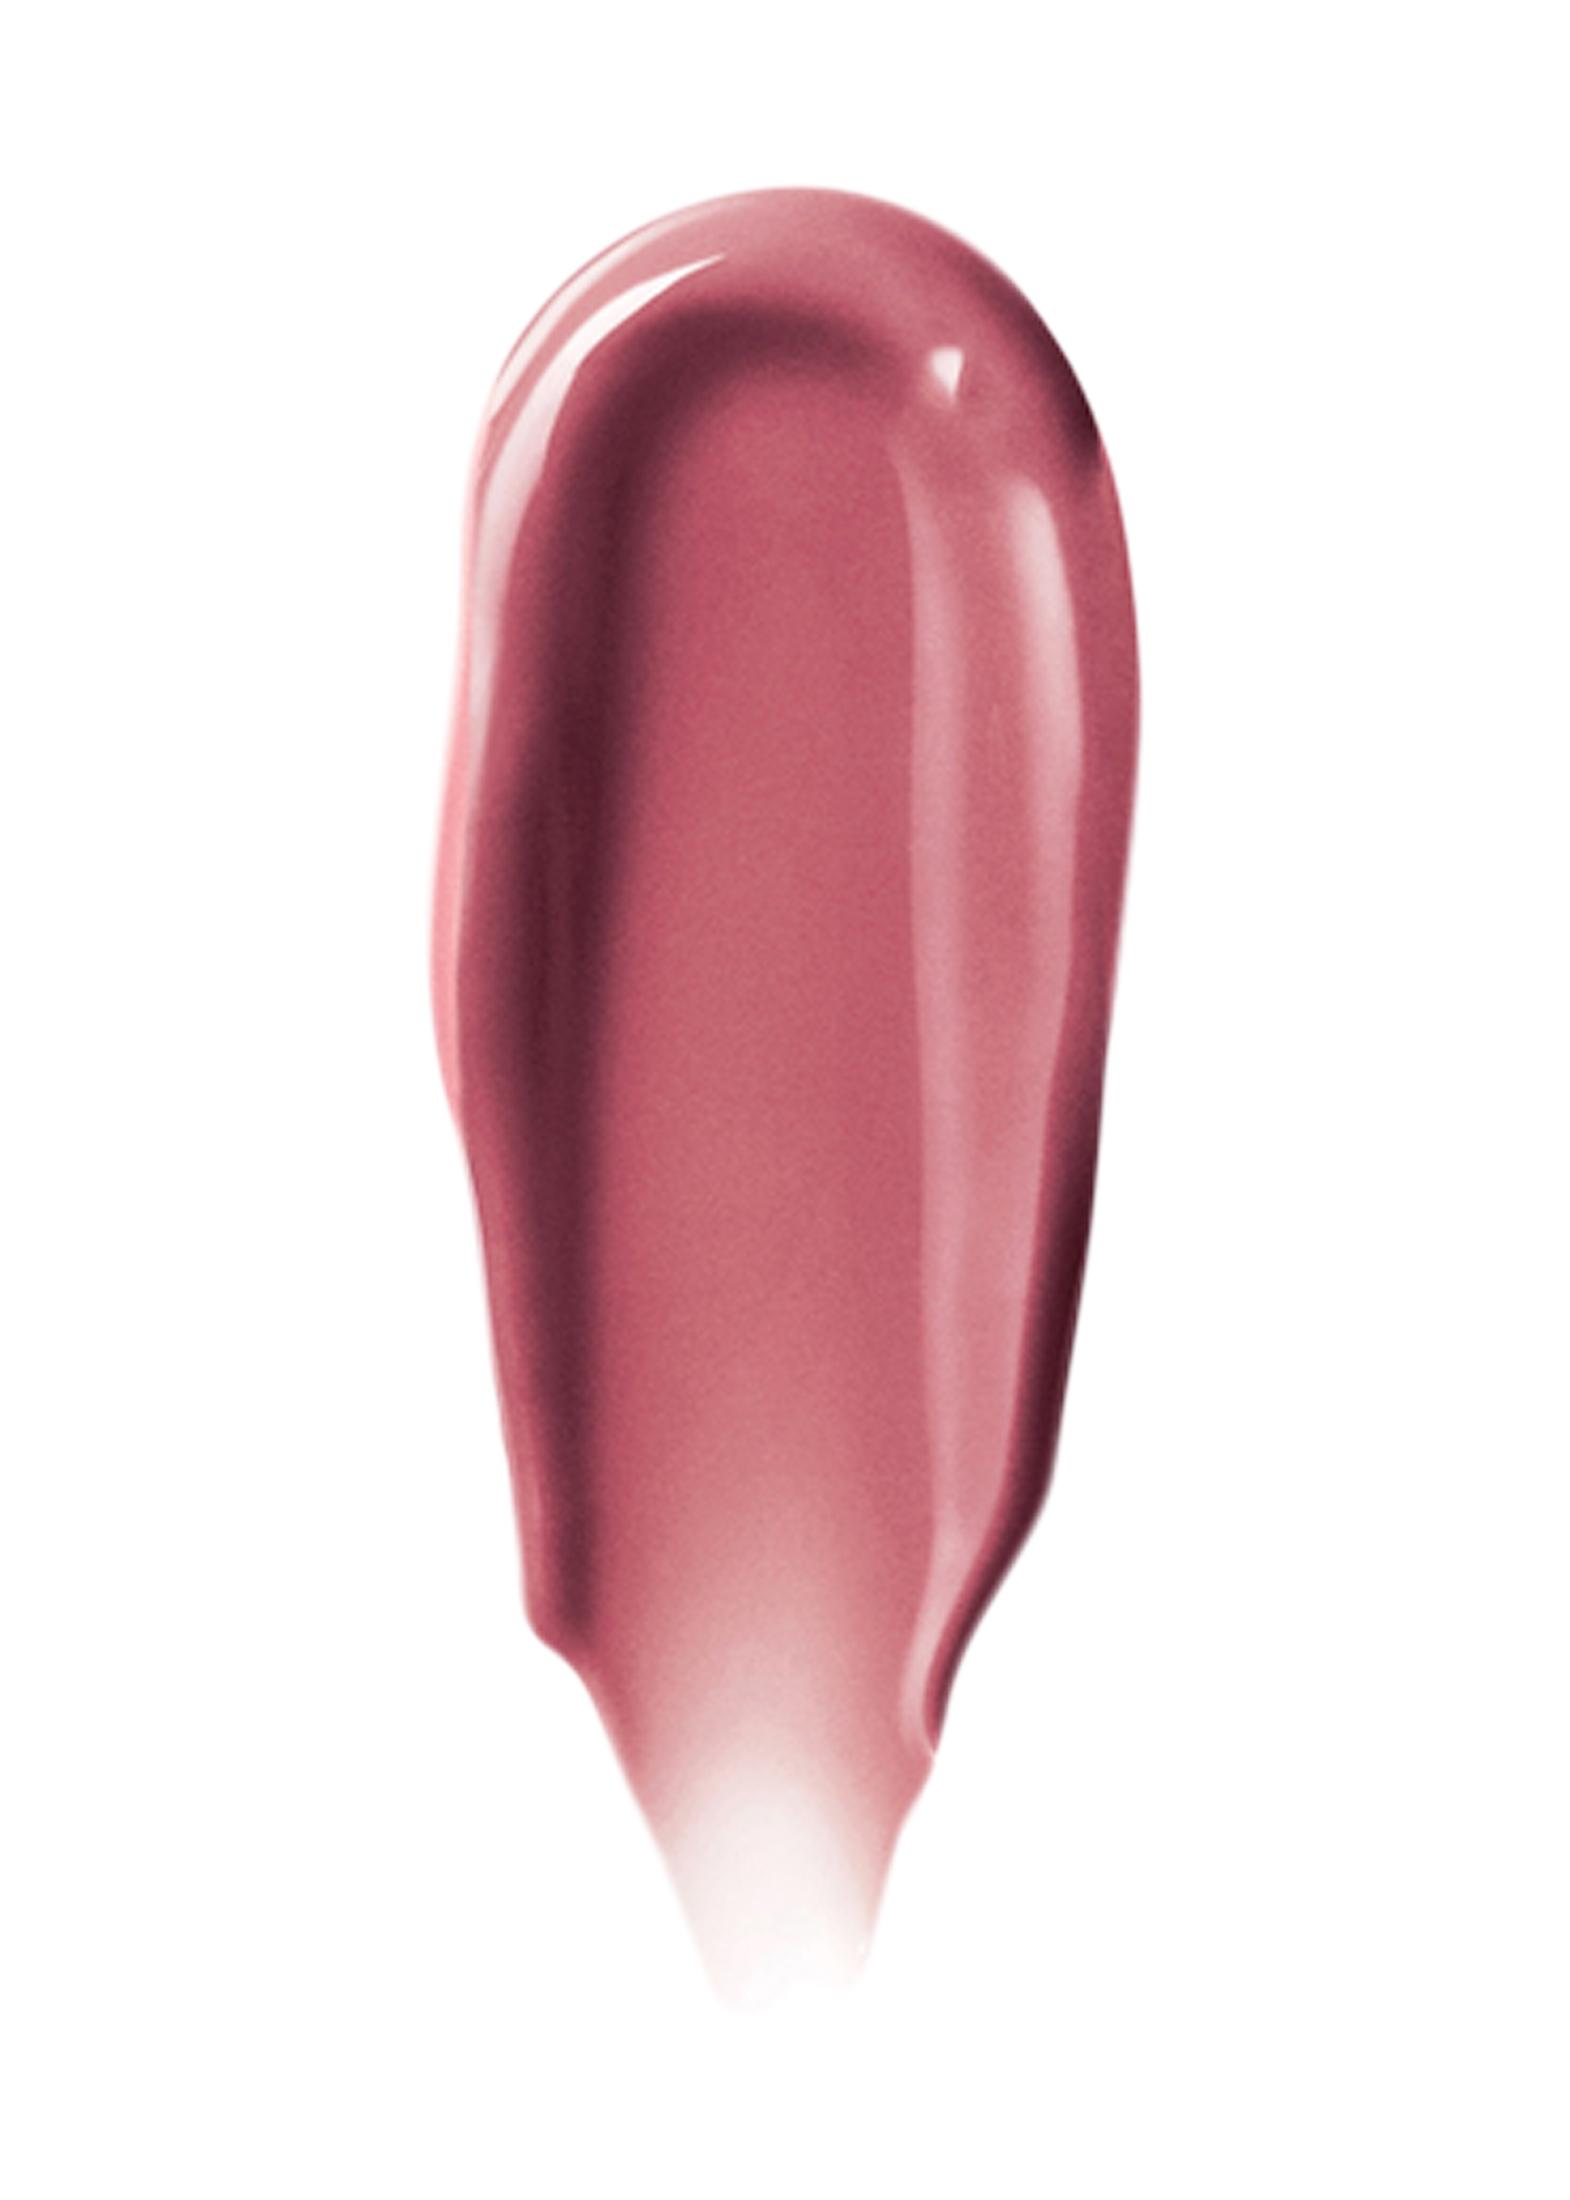 Crushed Liquid Lipstick Smoothie Move image number 1